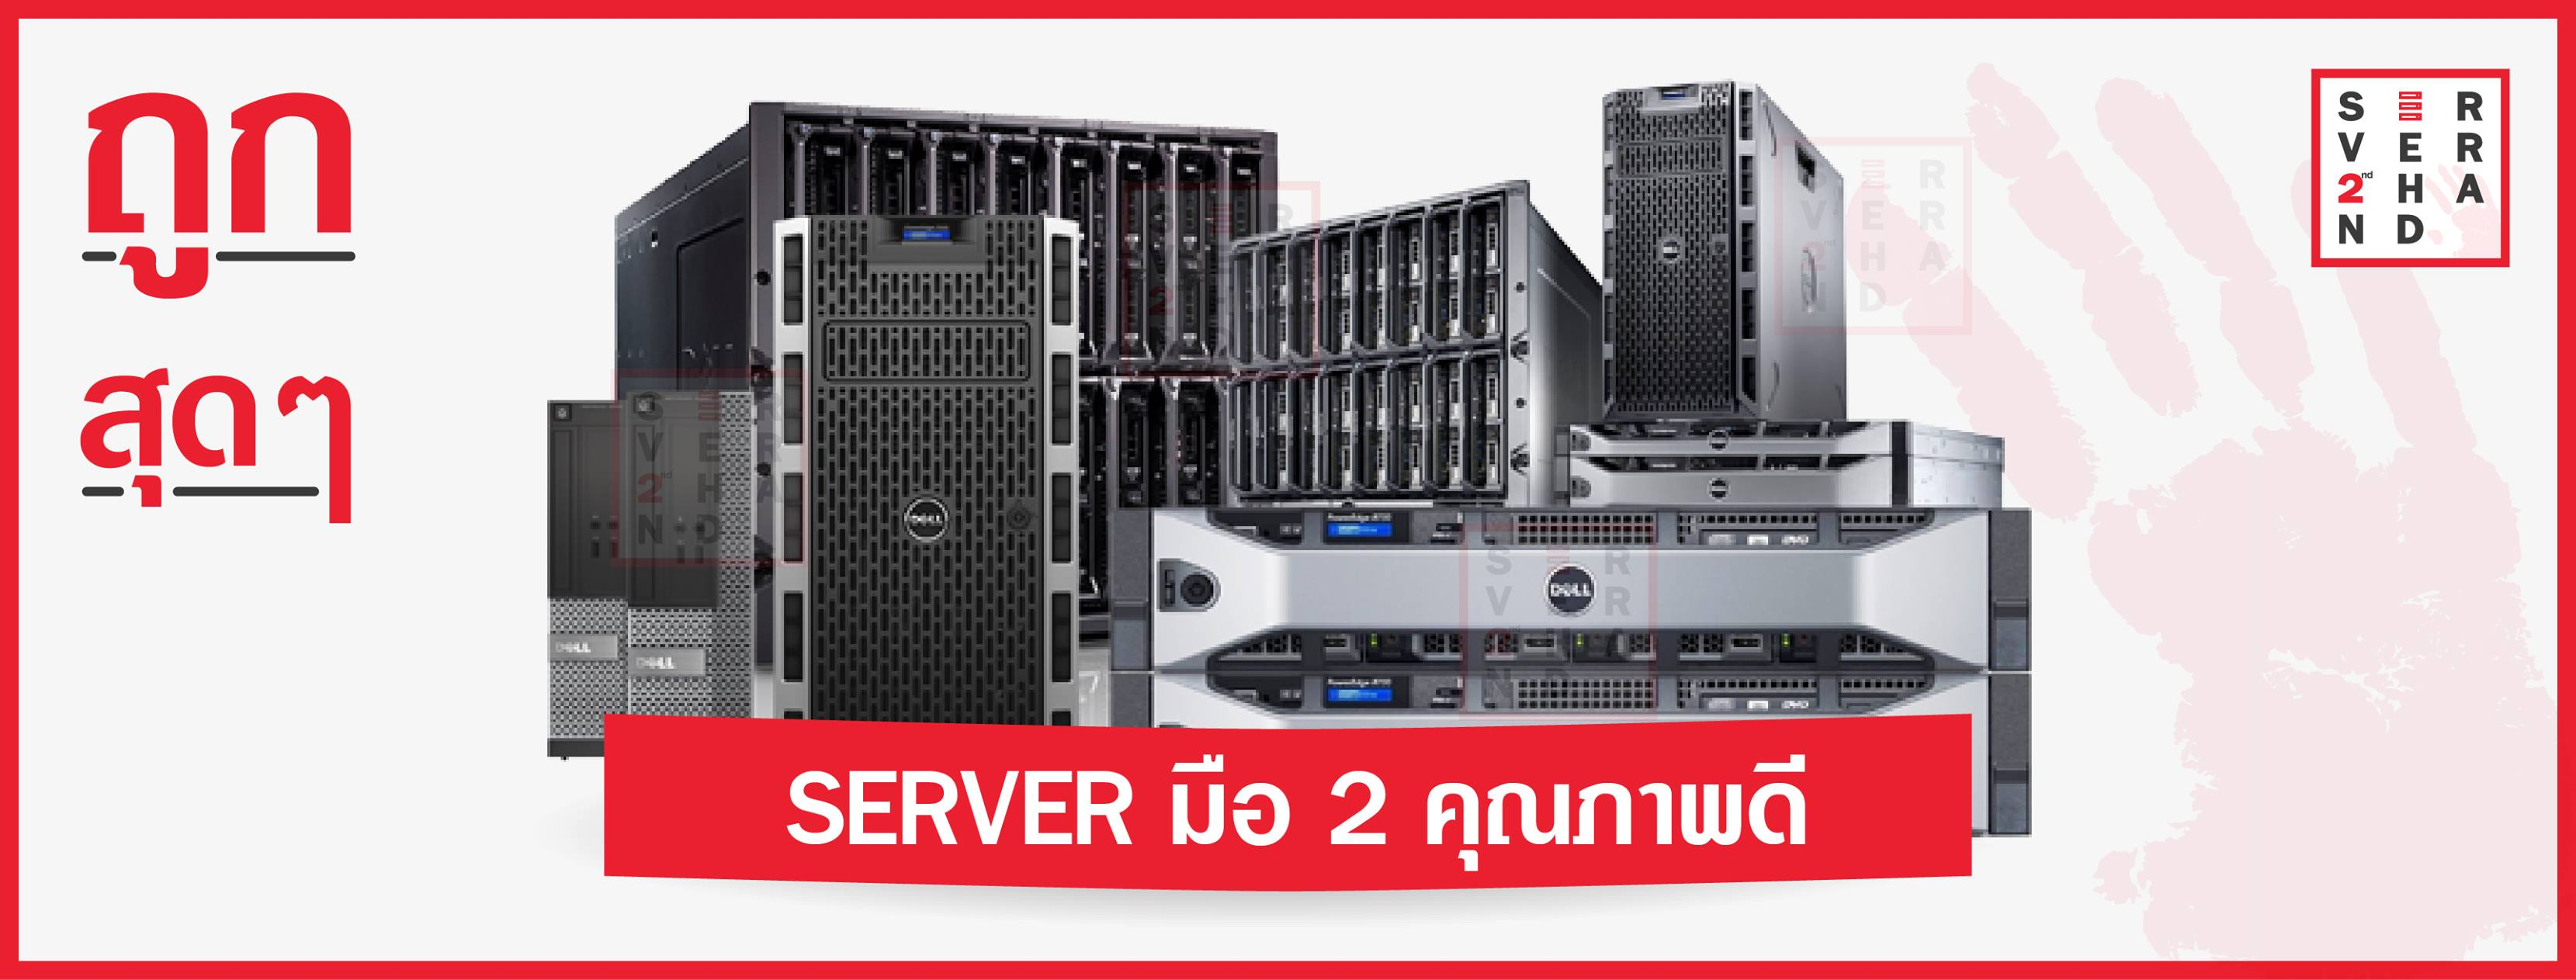 server มือสอง